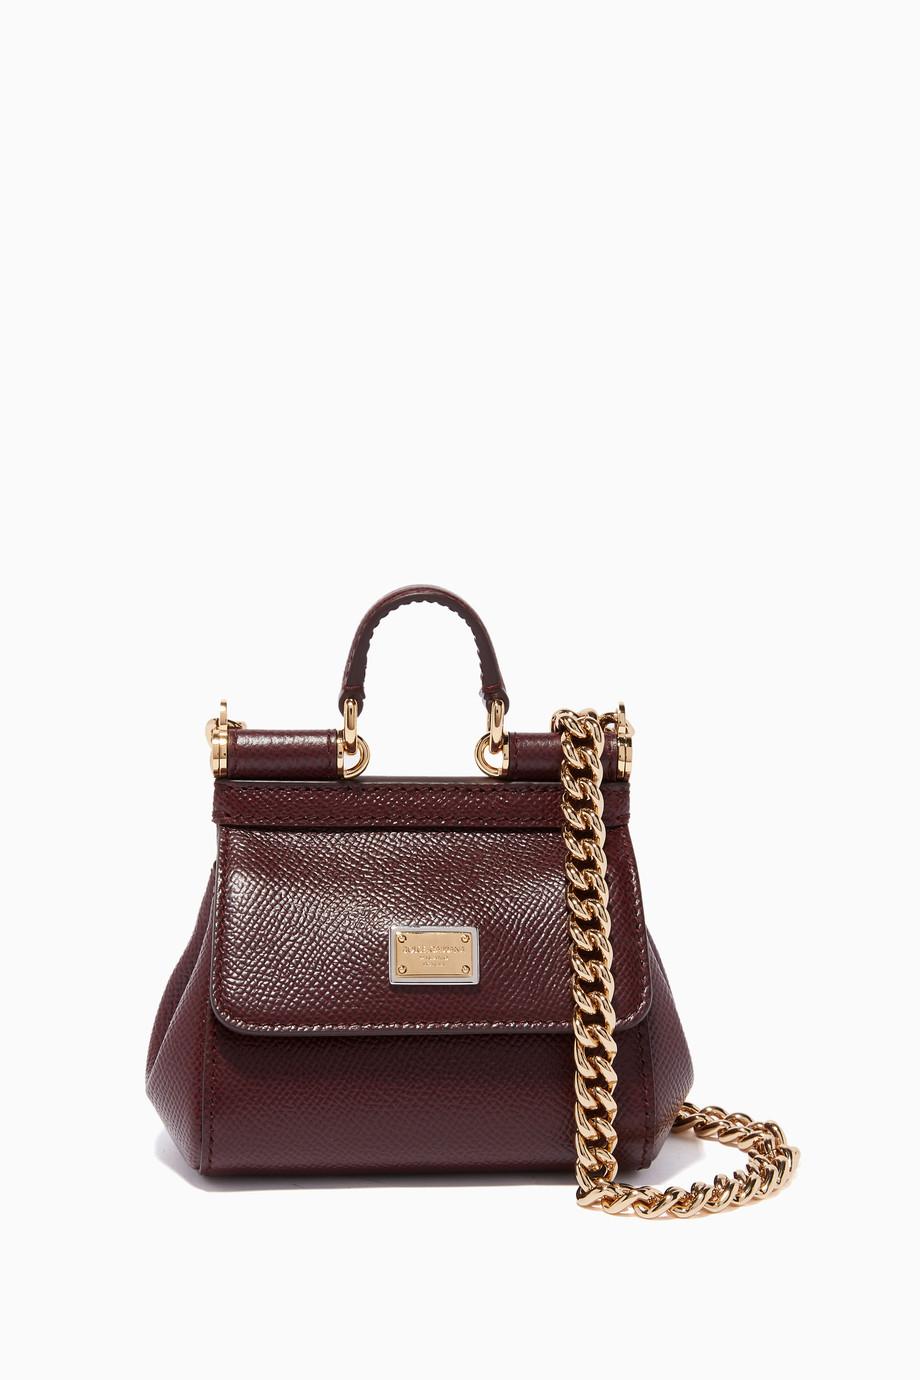 ed15f6cfa تسوق حقيبة كروس ميس سيسلي صغيرة برغندي Dolce & Gabbana أحمر للنساء ...